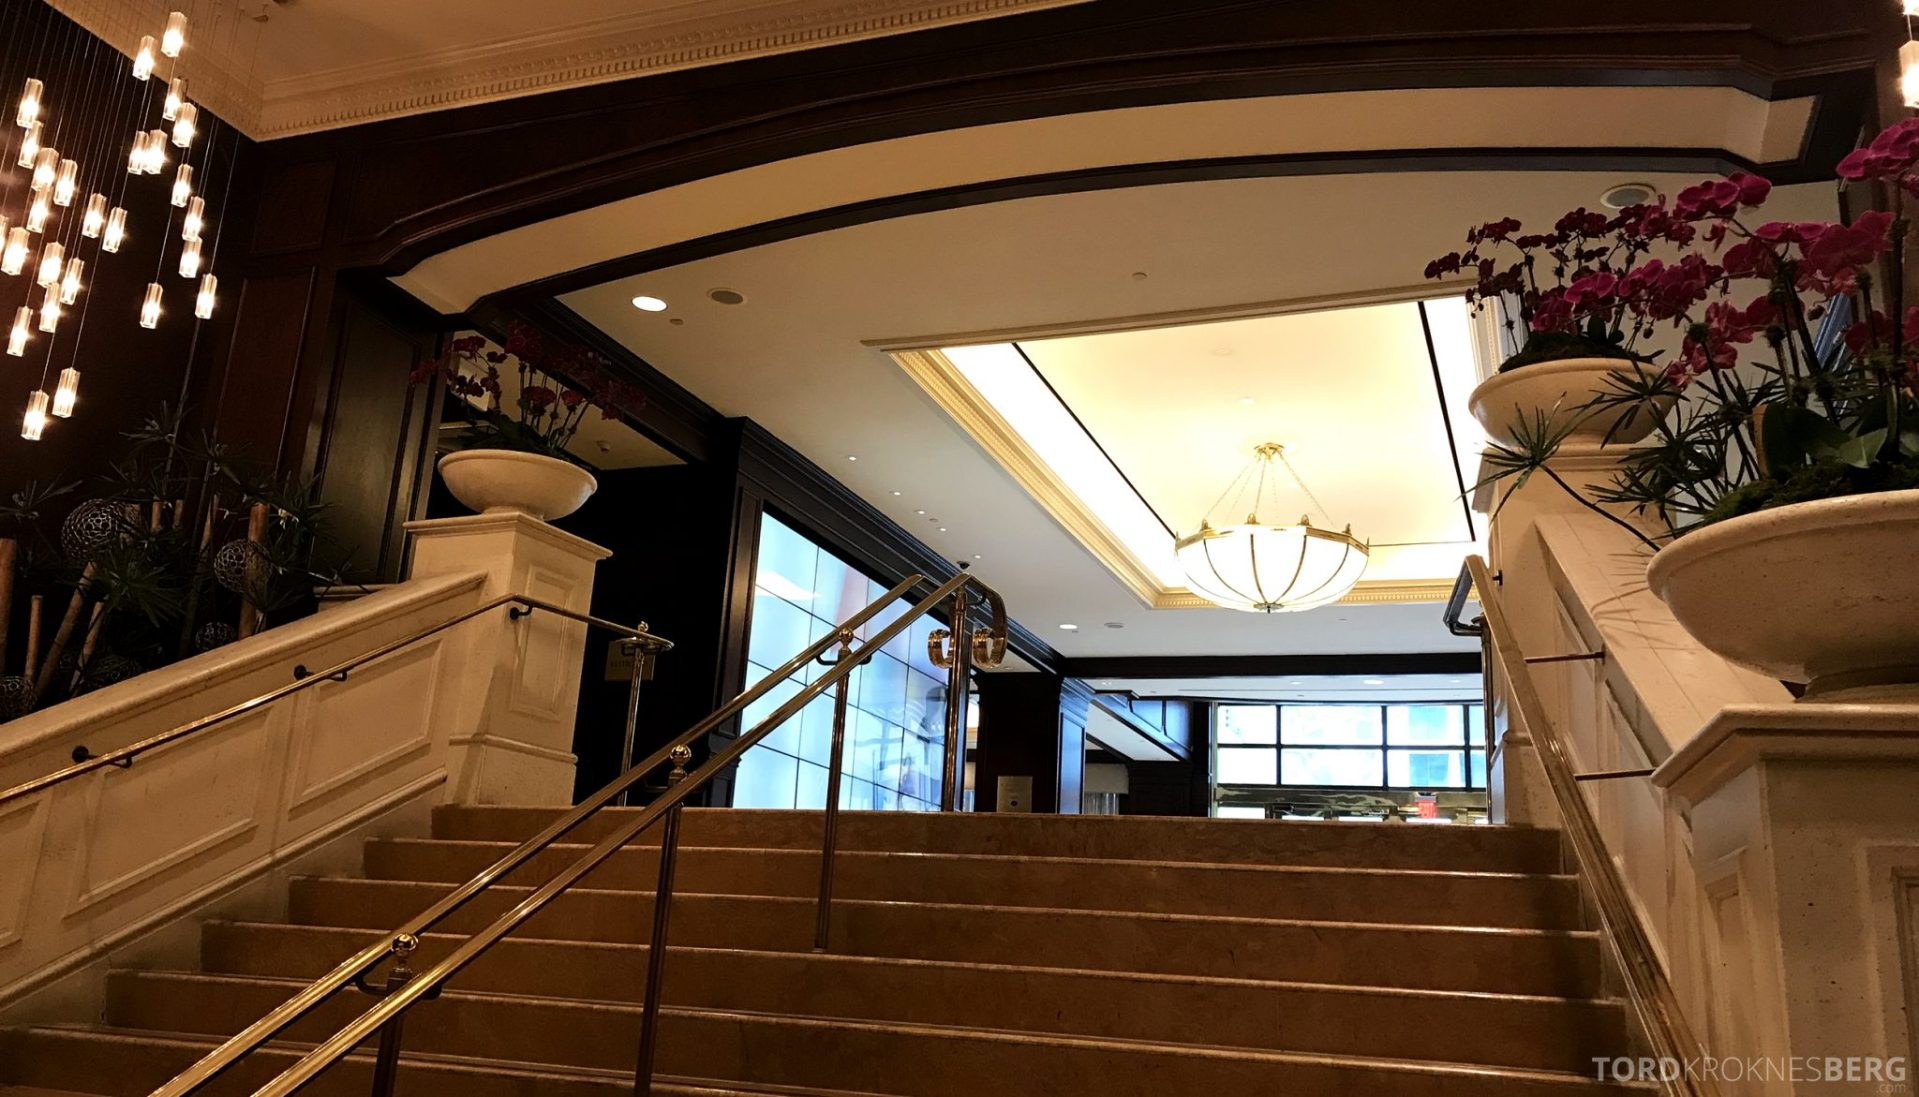 JW Marriott Miami Hotel bakveien